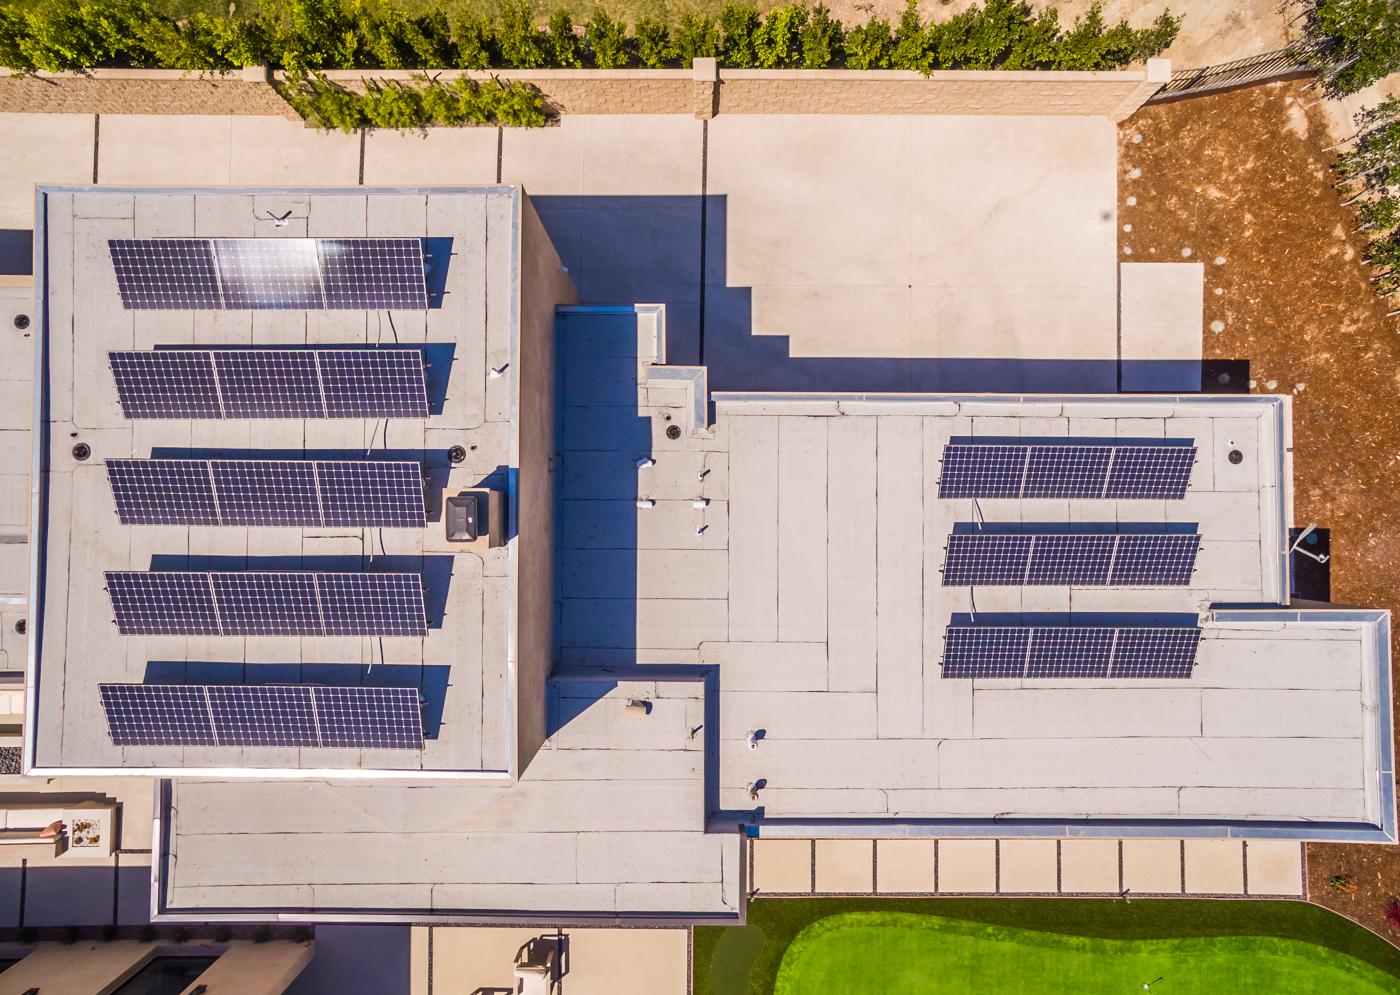 escondido-roof-solar-panels